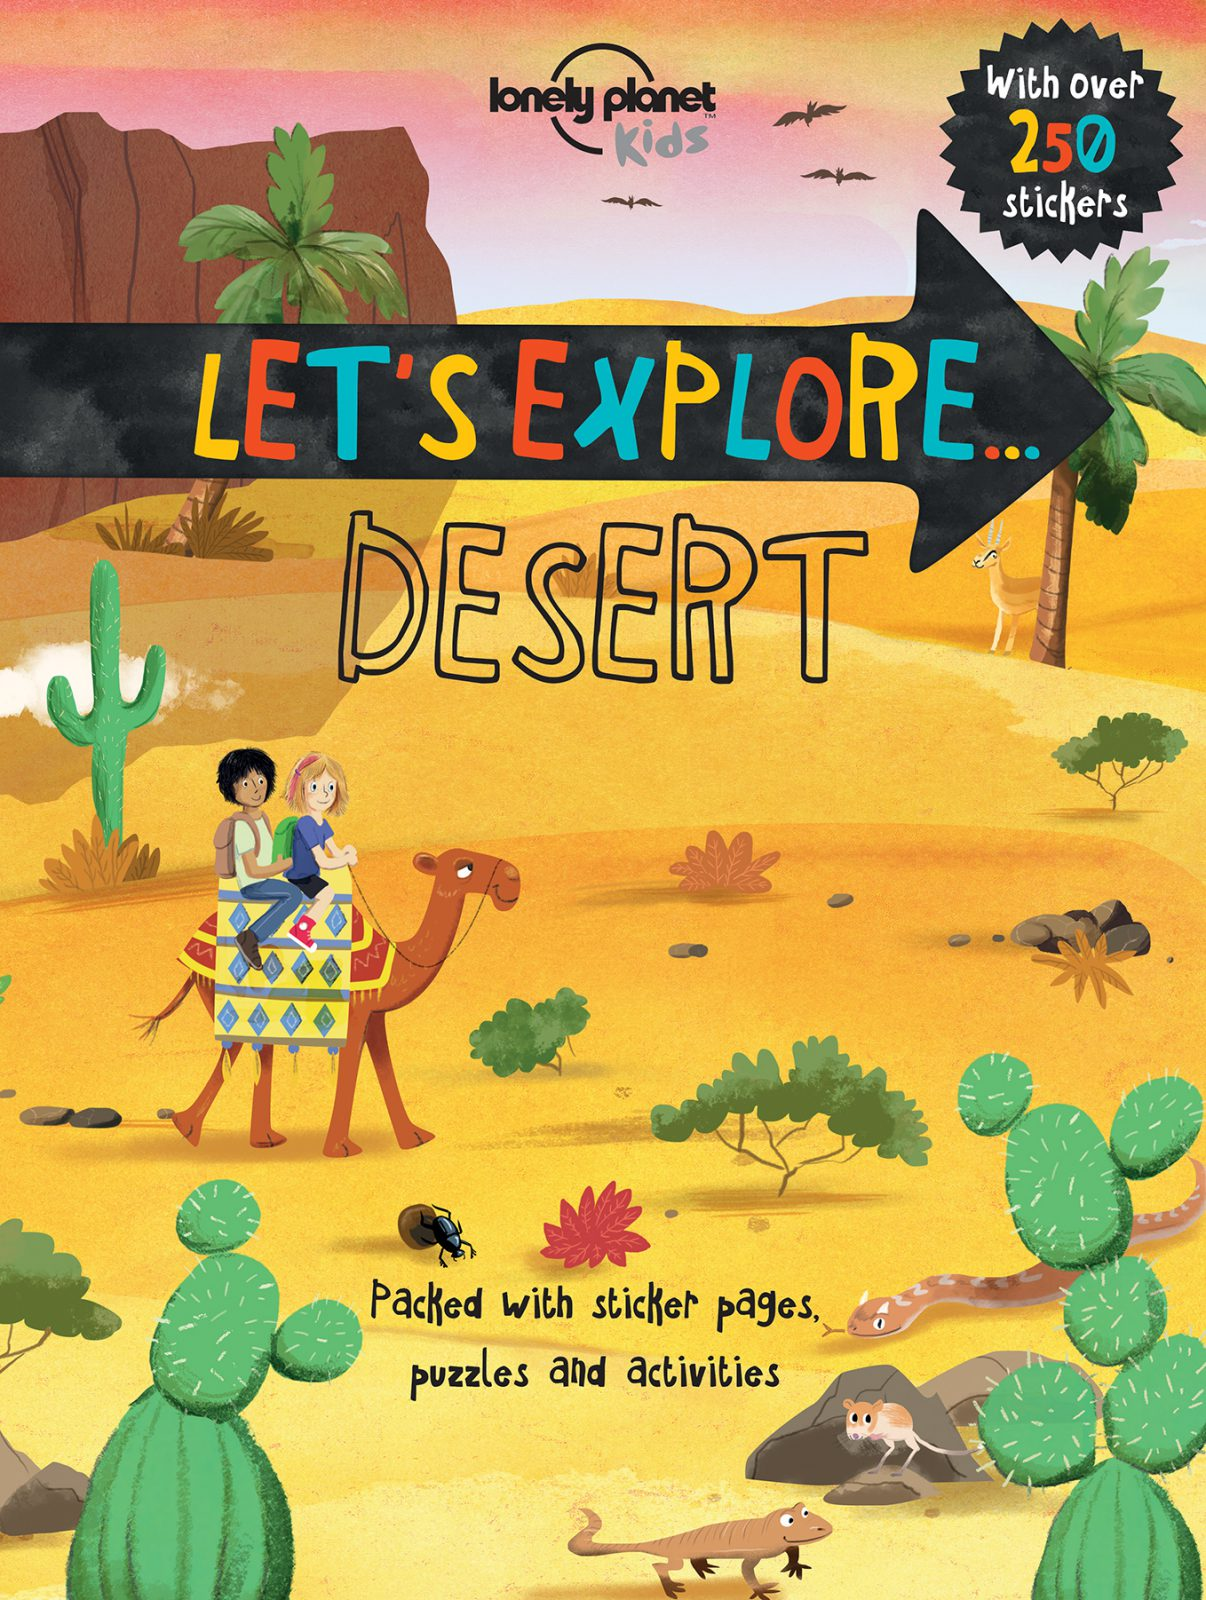 Let's Explore... Desert